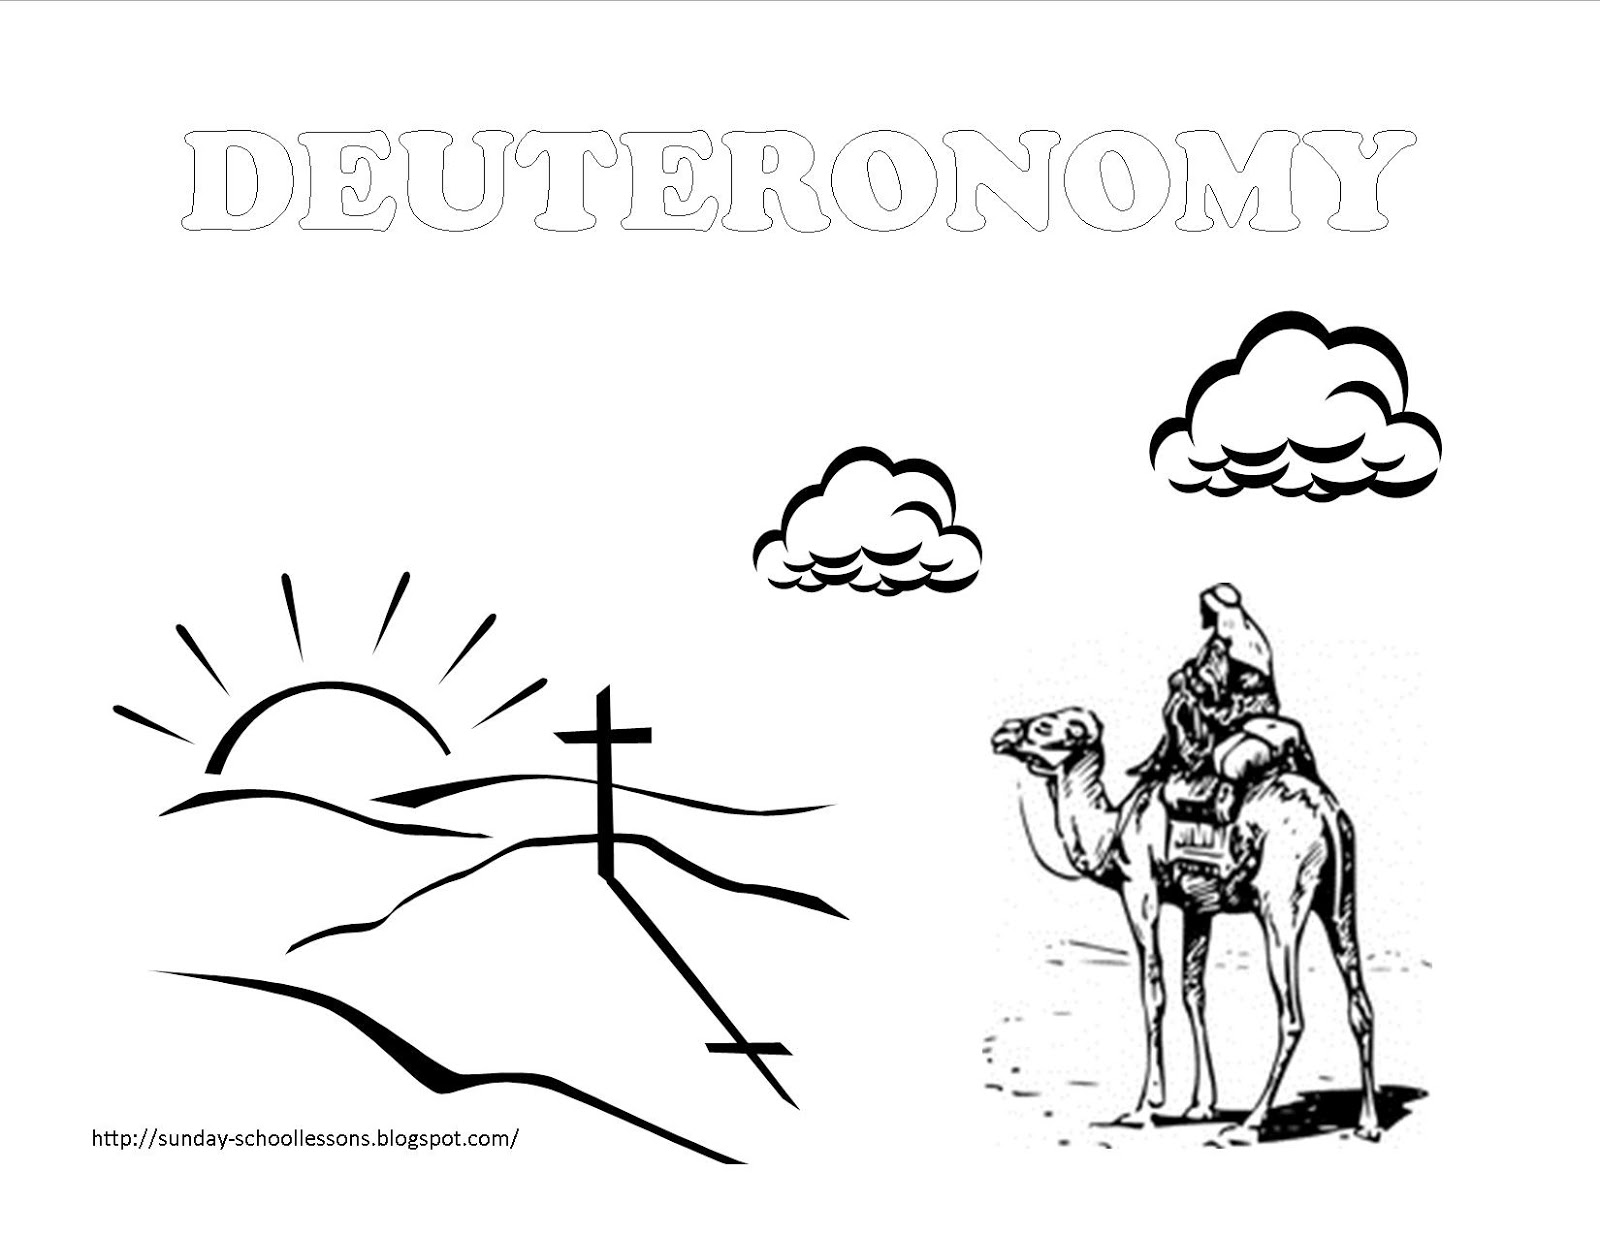 deuteronomy bible coloring pages - photo#9